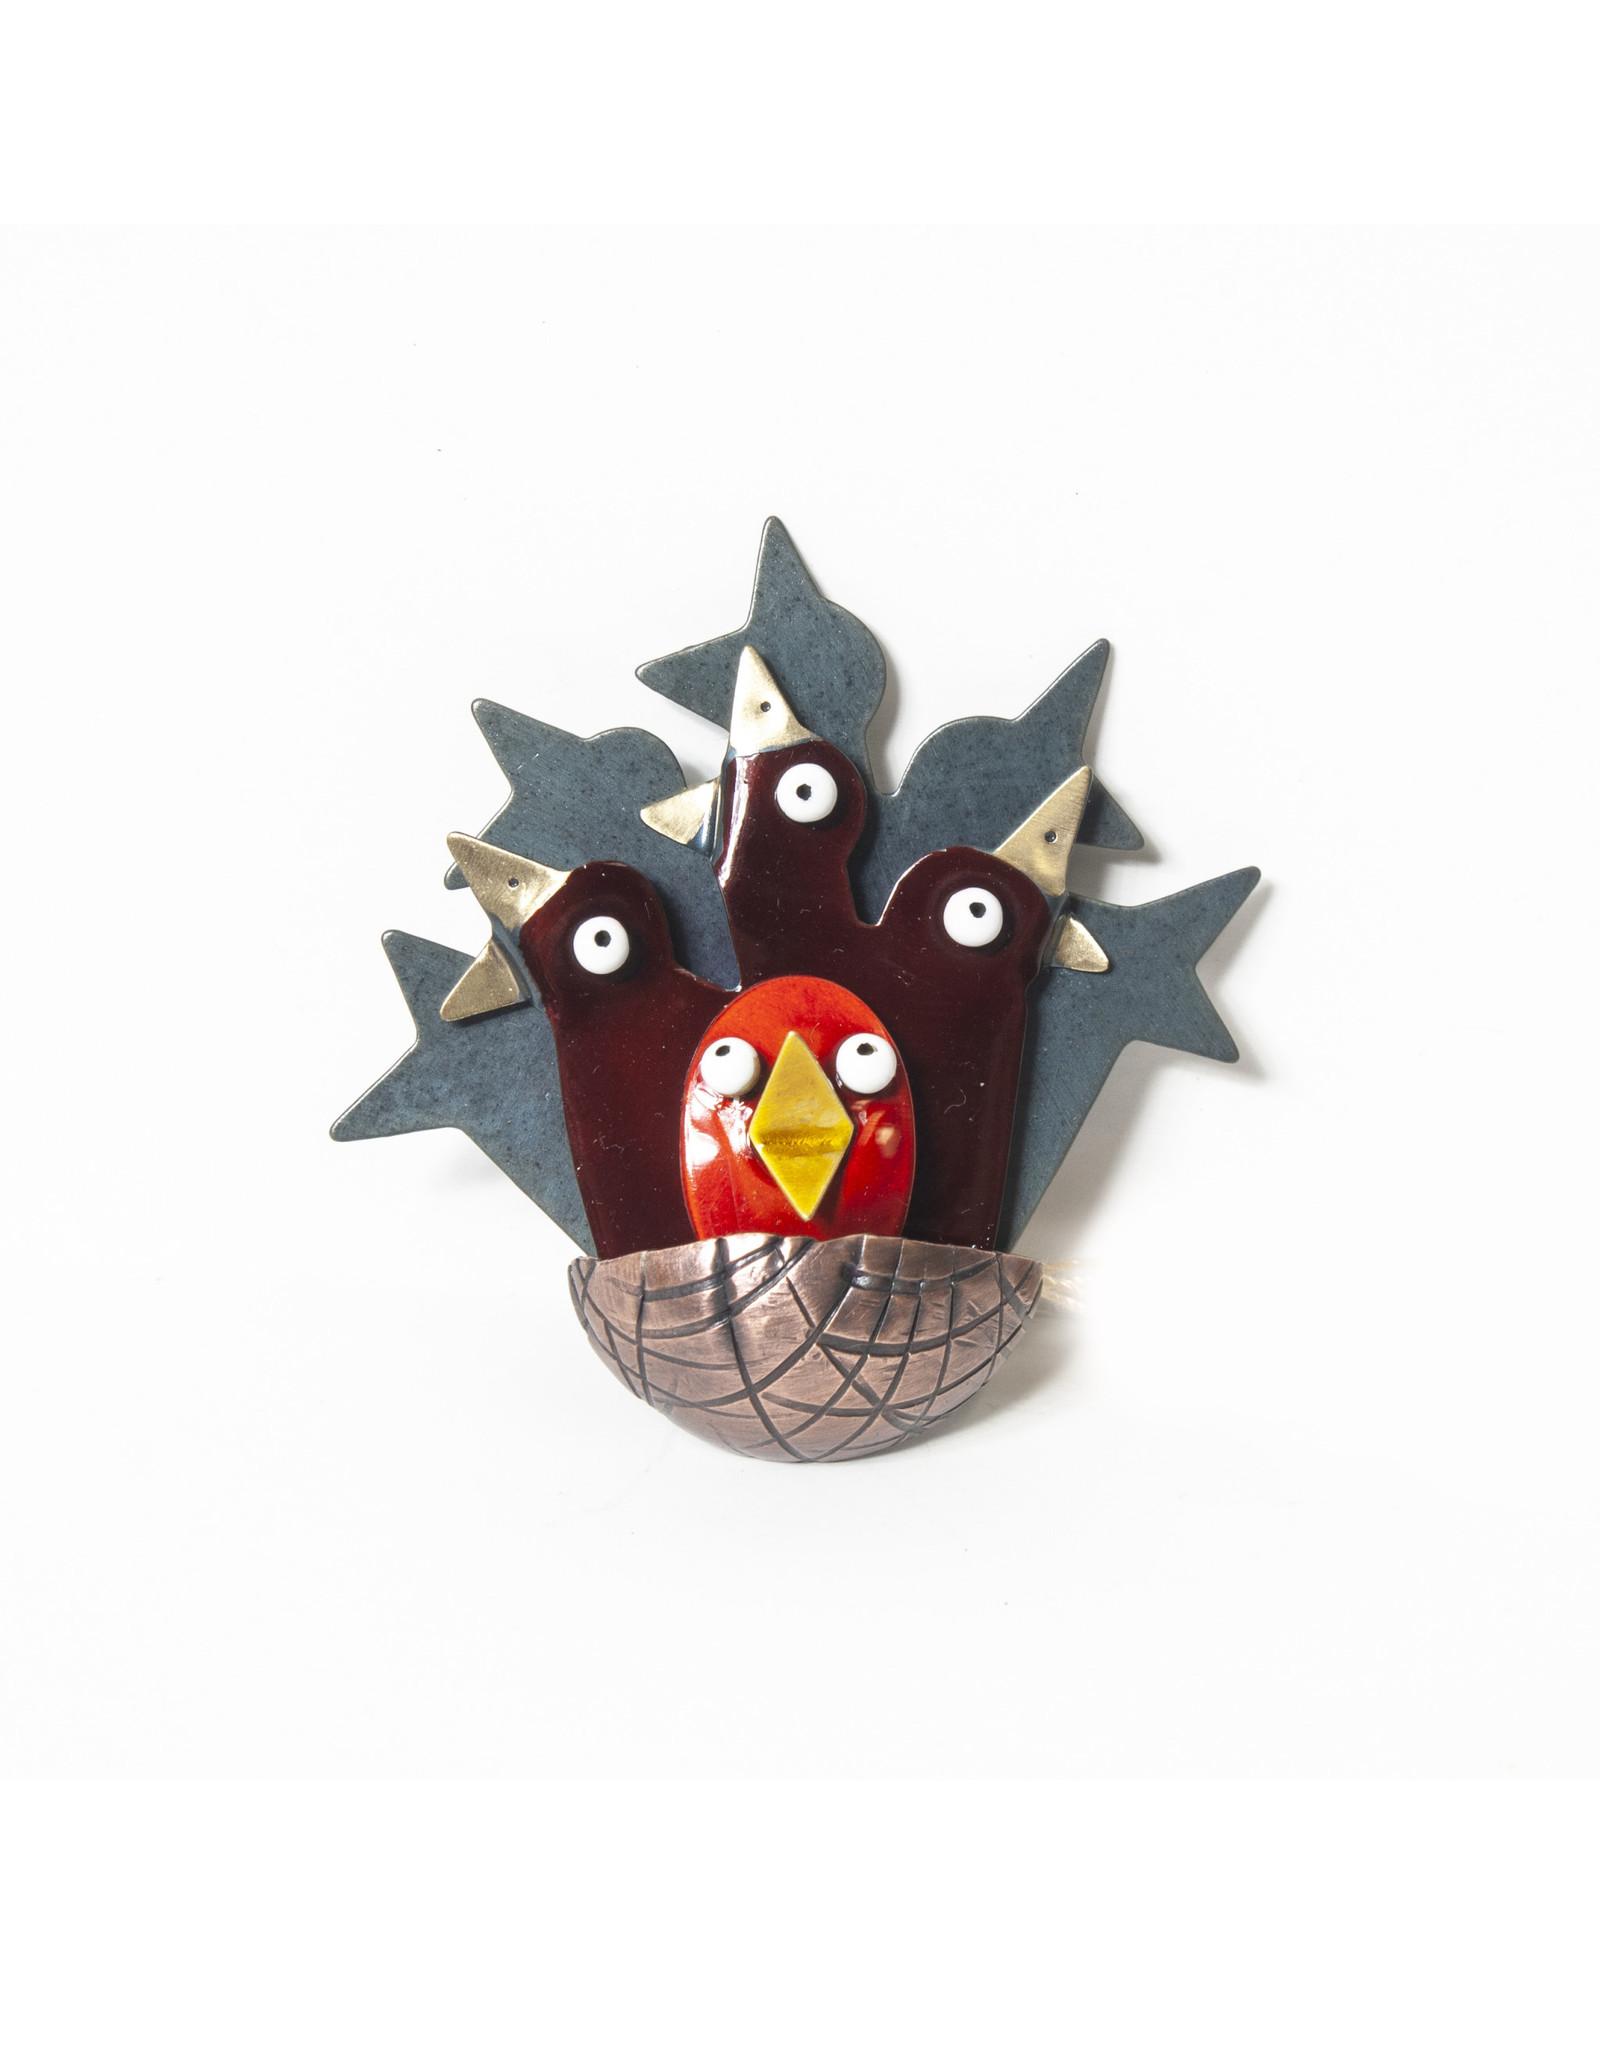 Chickenscratch Chickenscratch Full Nest Pin